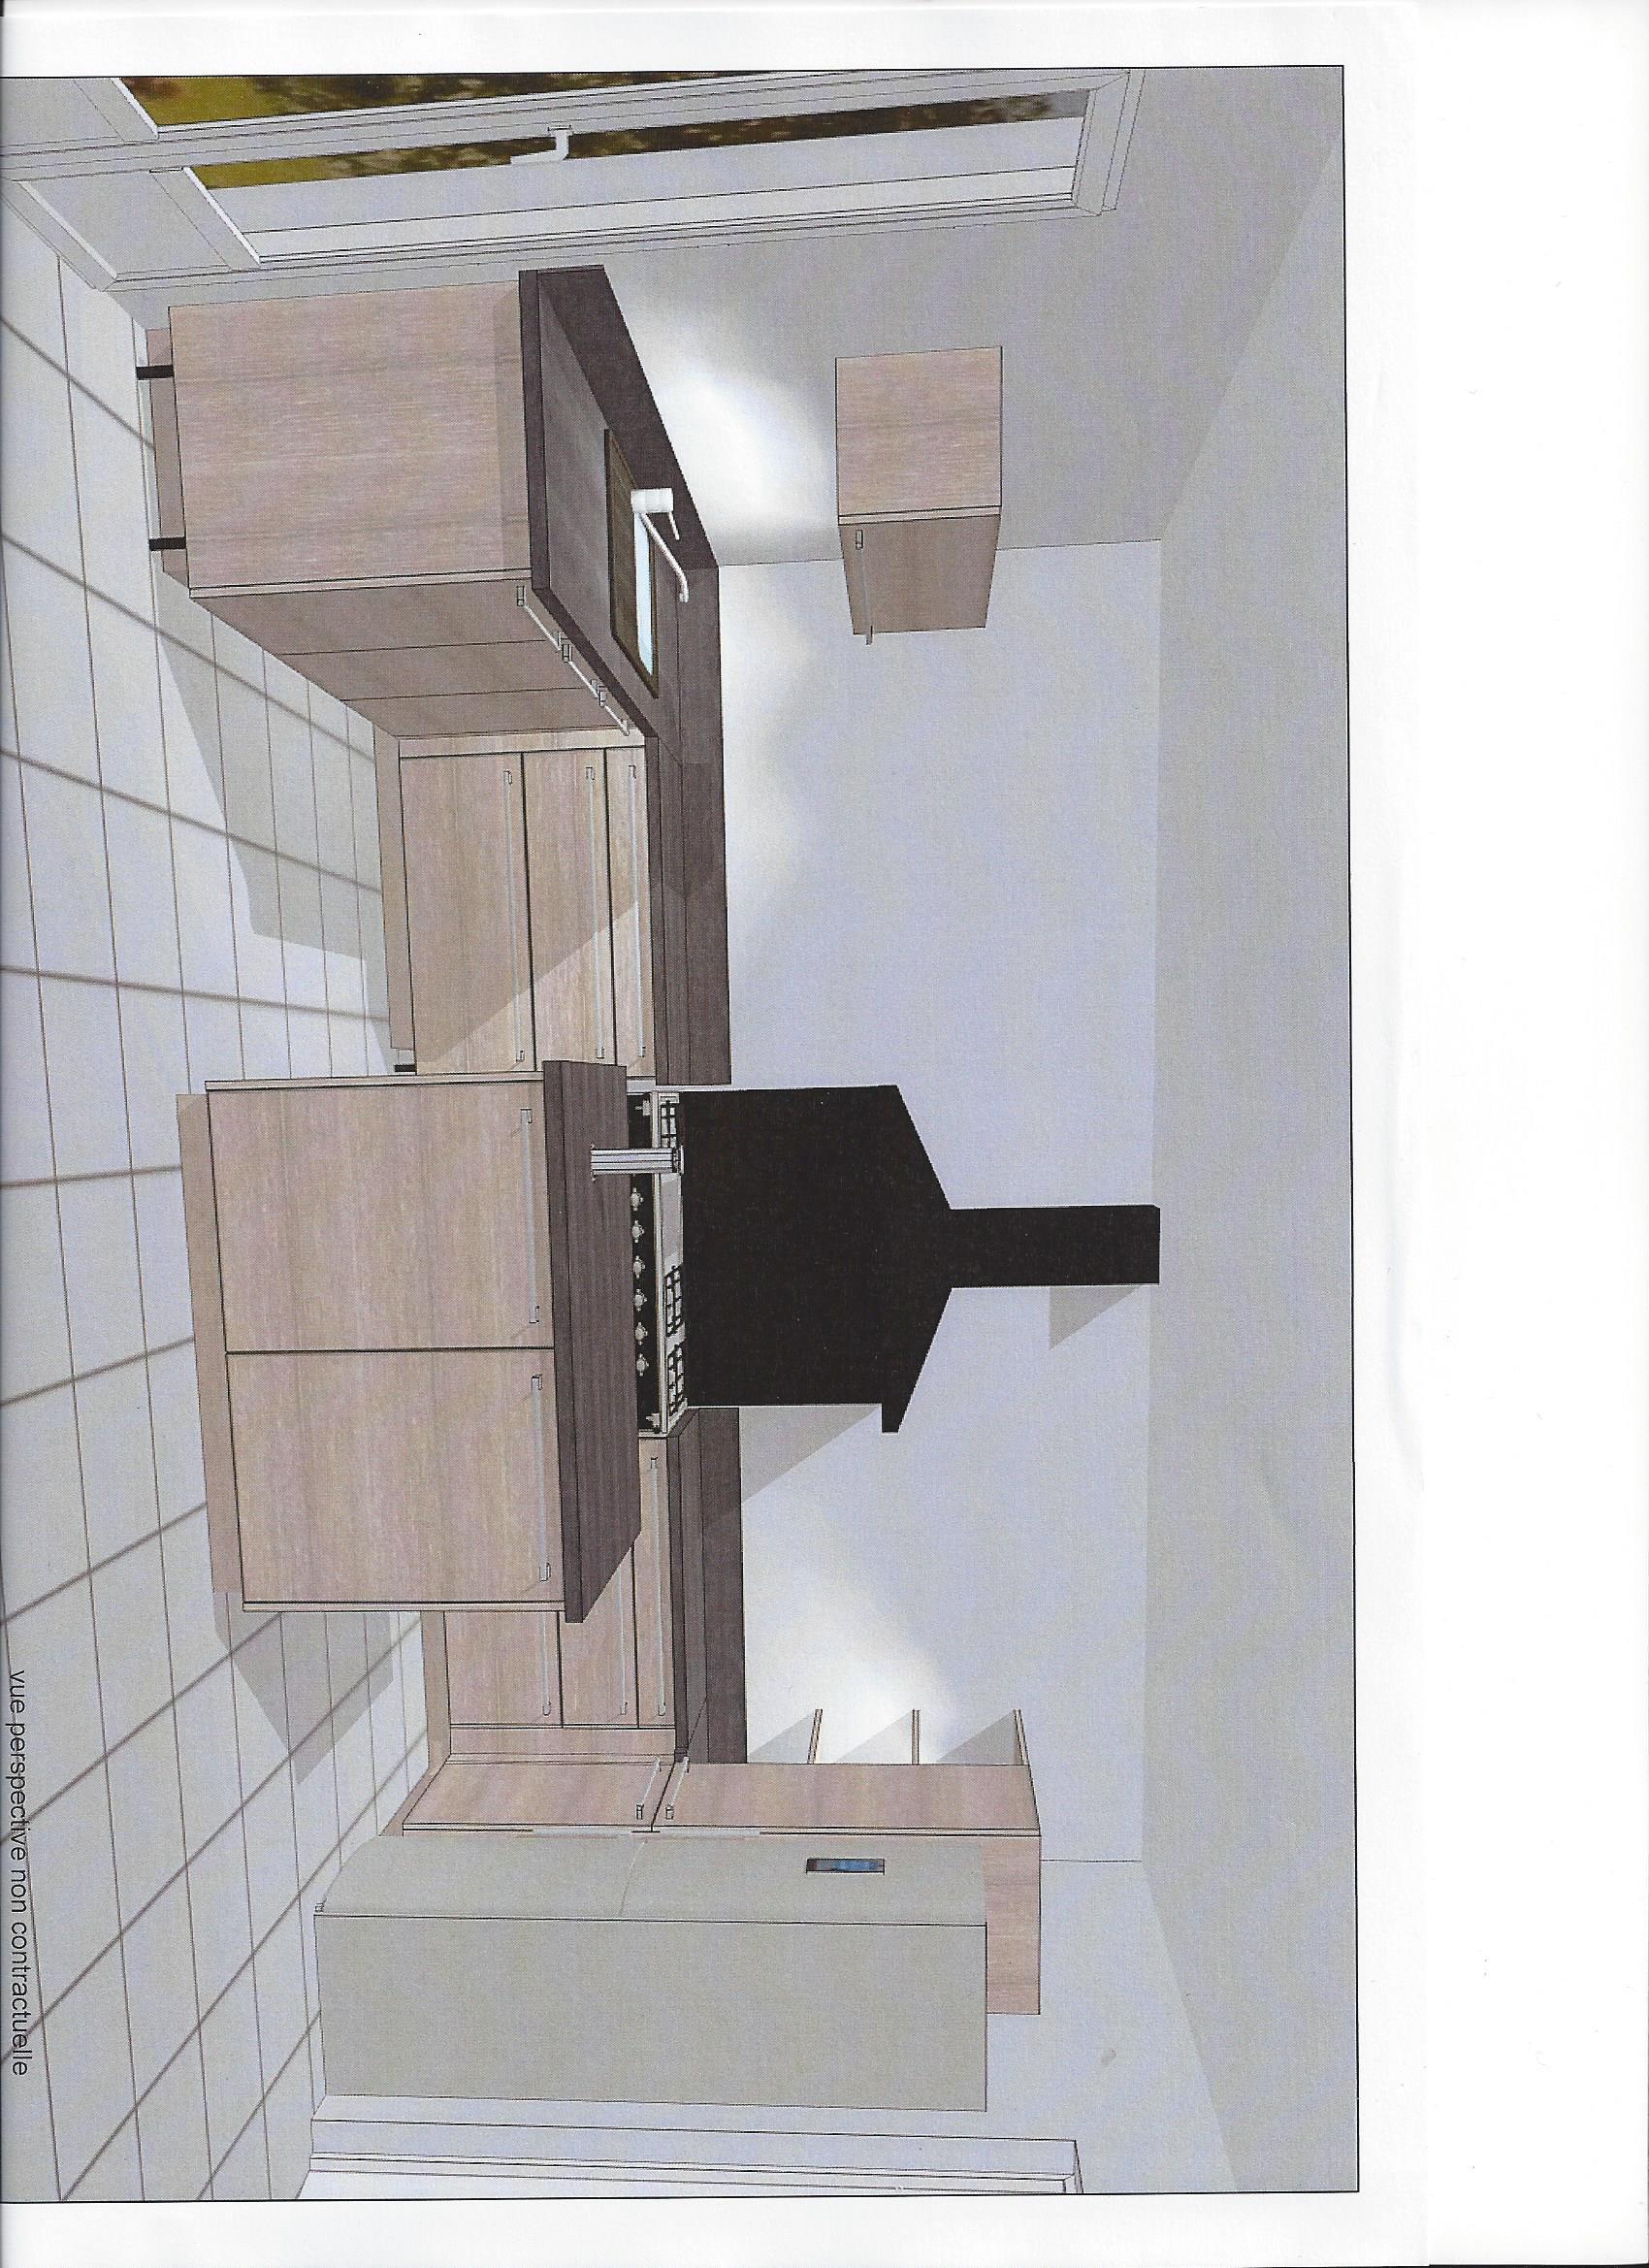 cuisine schmidt avis design cuisines schmidt avis strasbourg 11 cuisines cuisine cuisine. Black Bedroom Furniture Sets. Home Design Ideas